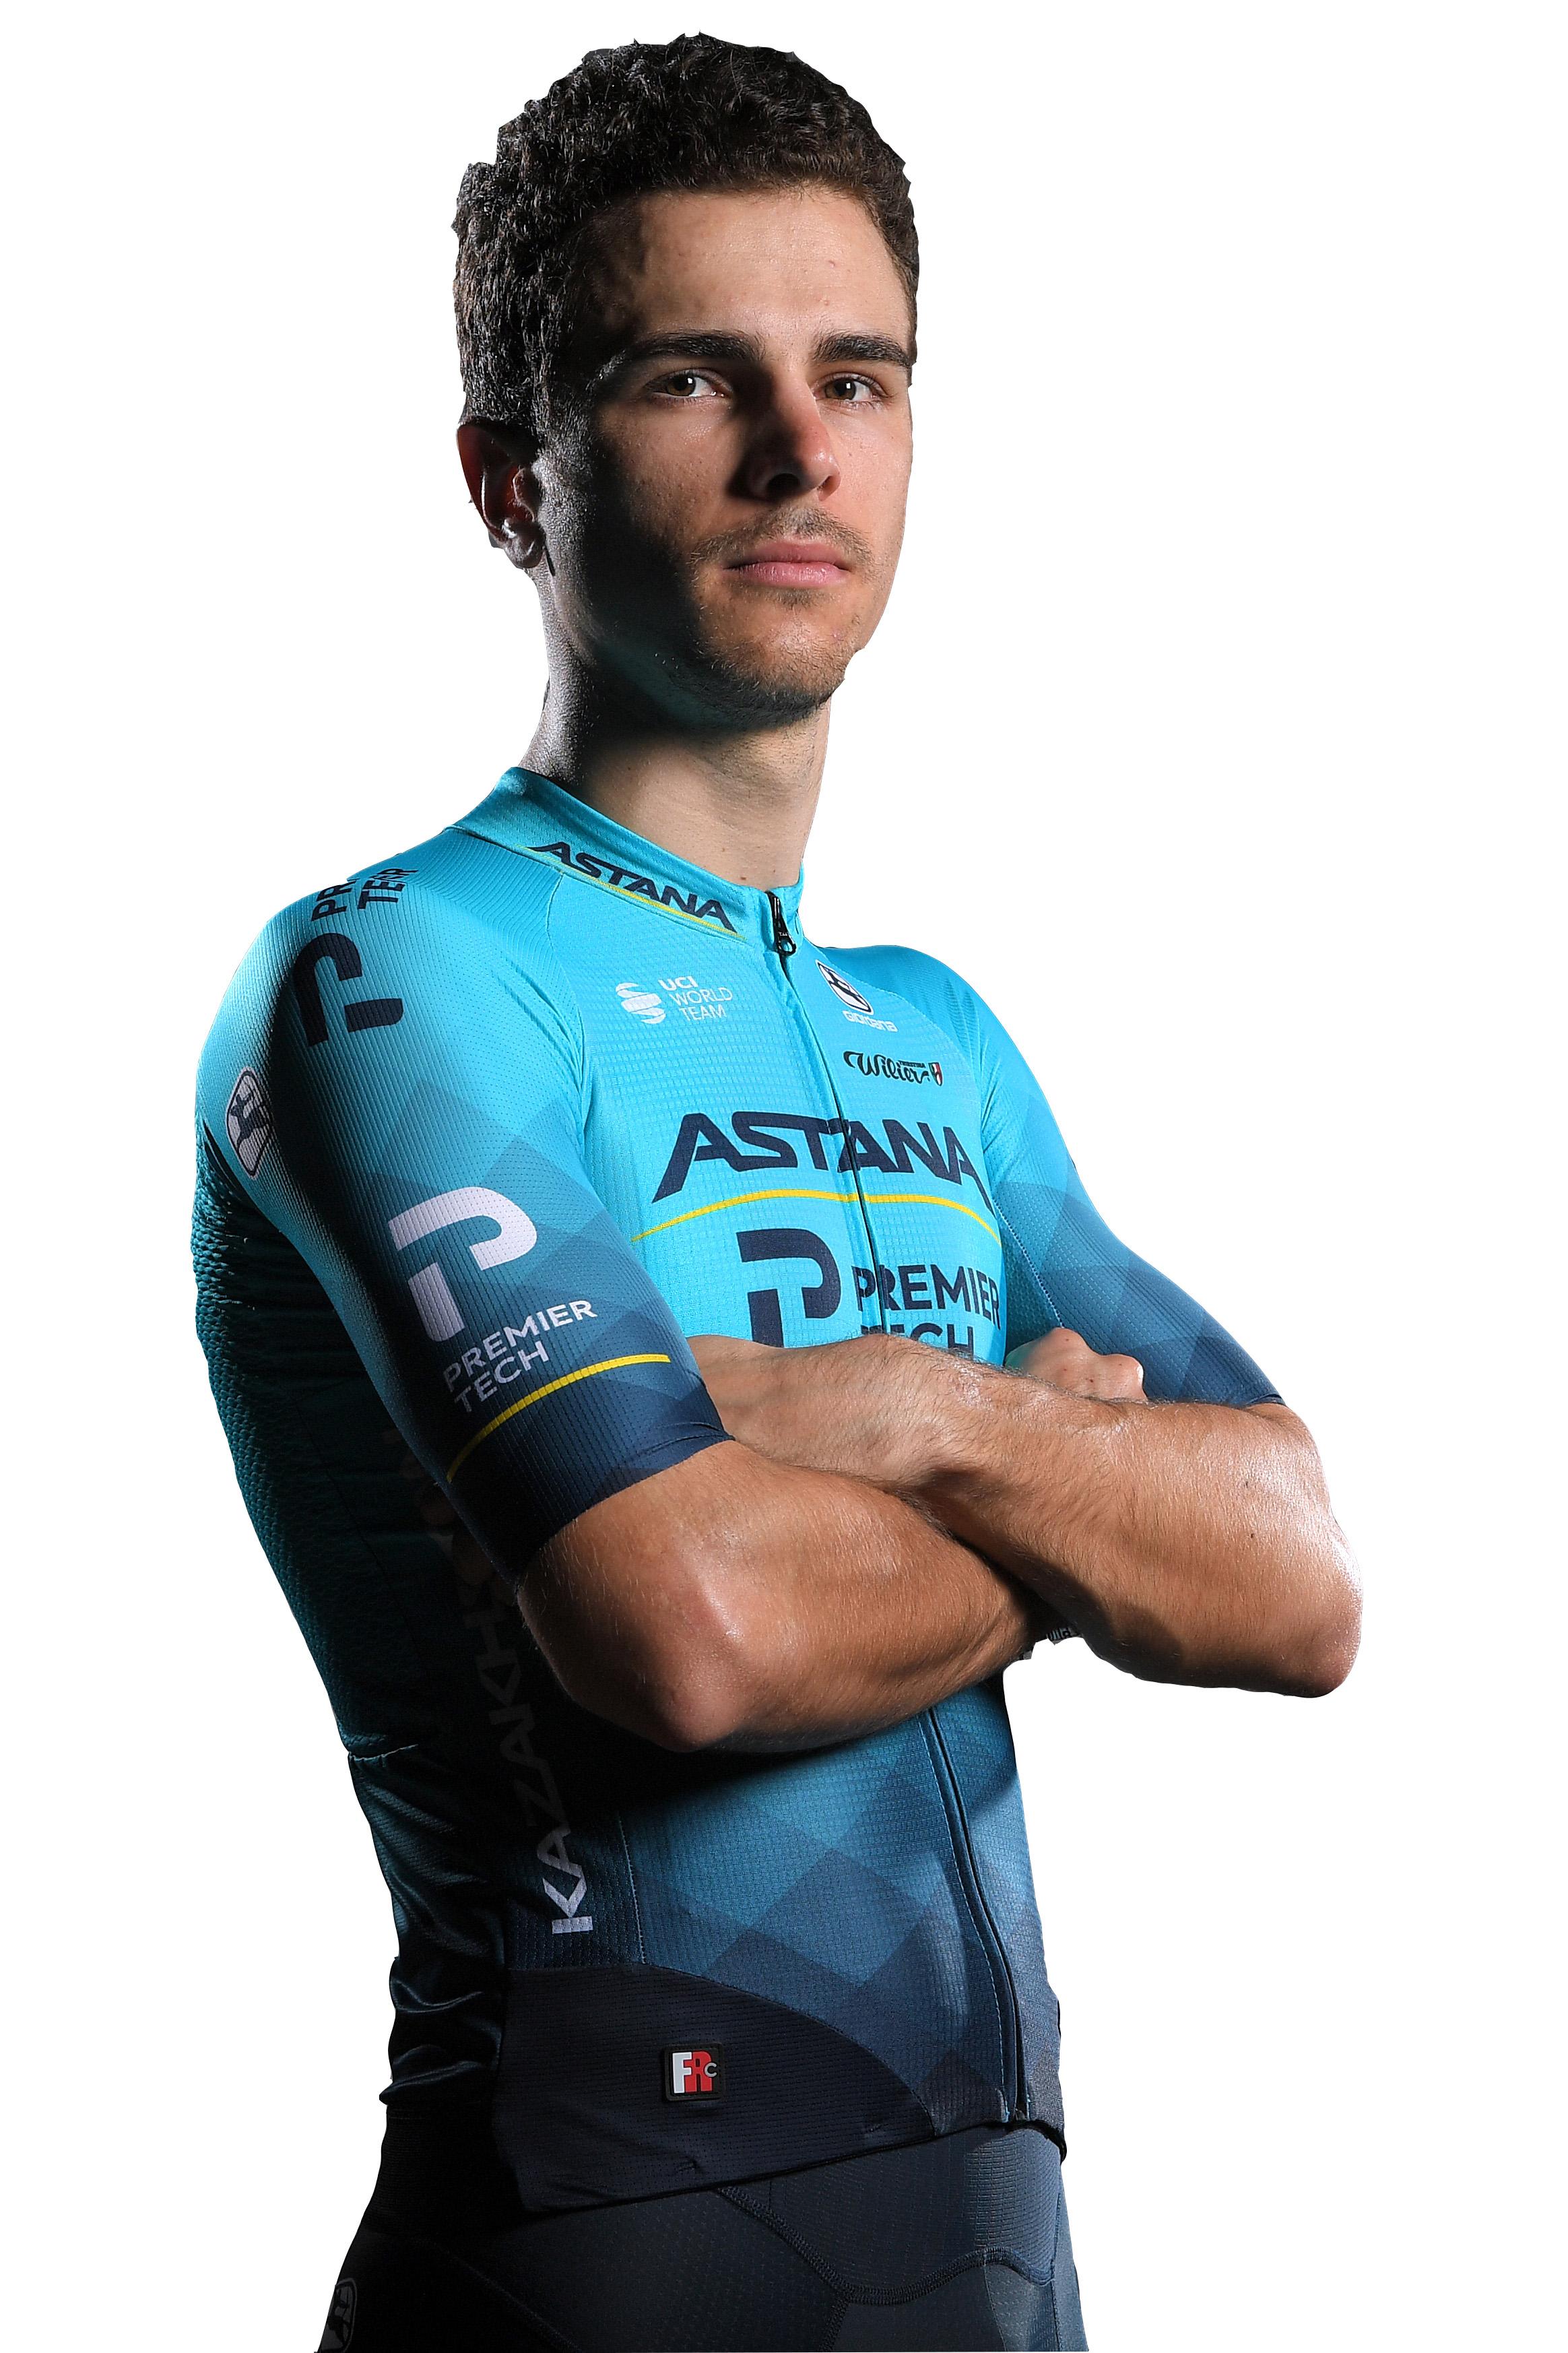 Samuele Battistella Astana Premier Tech 2021